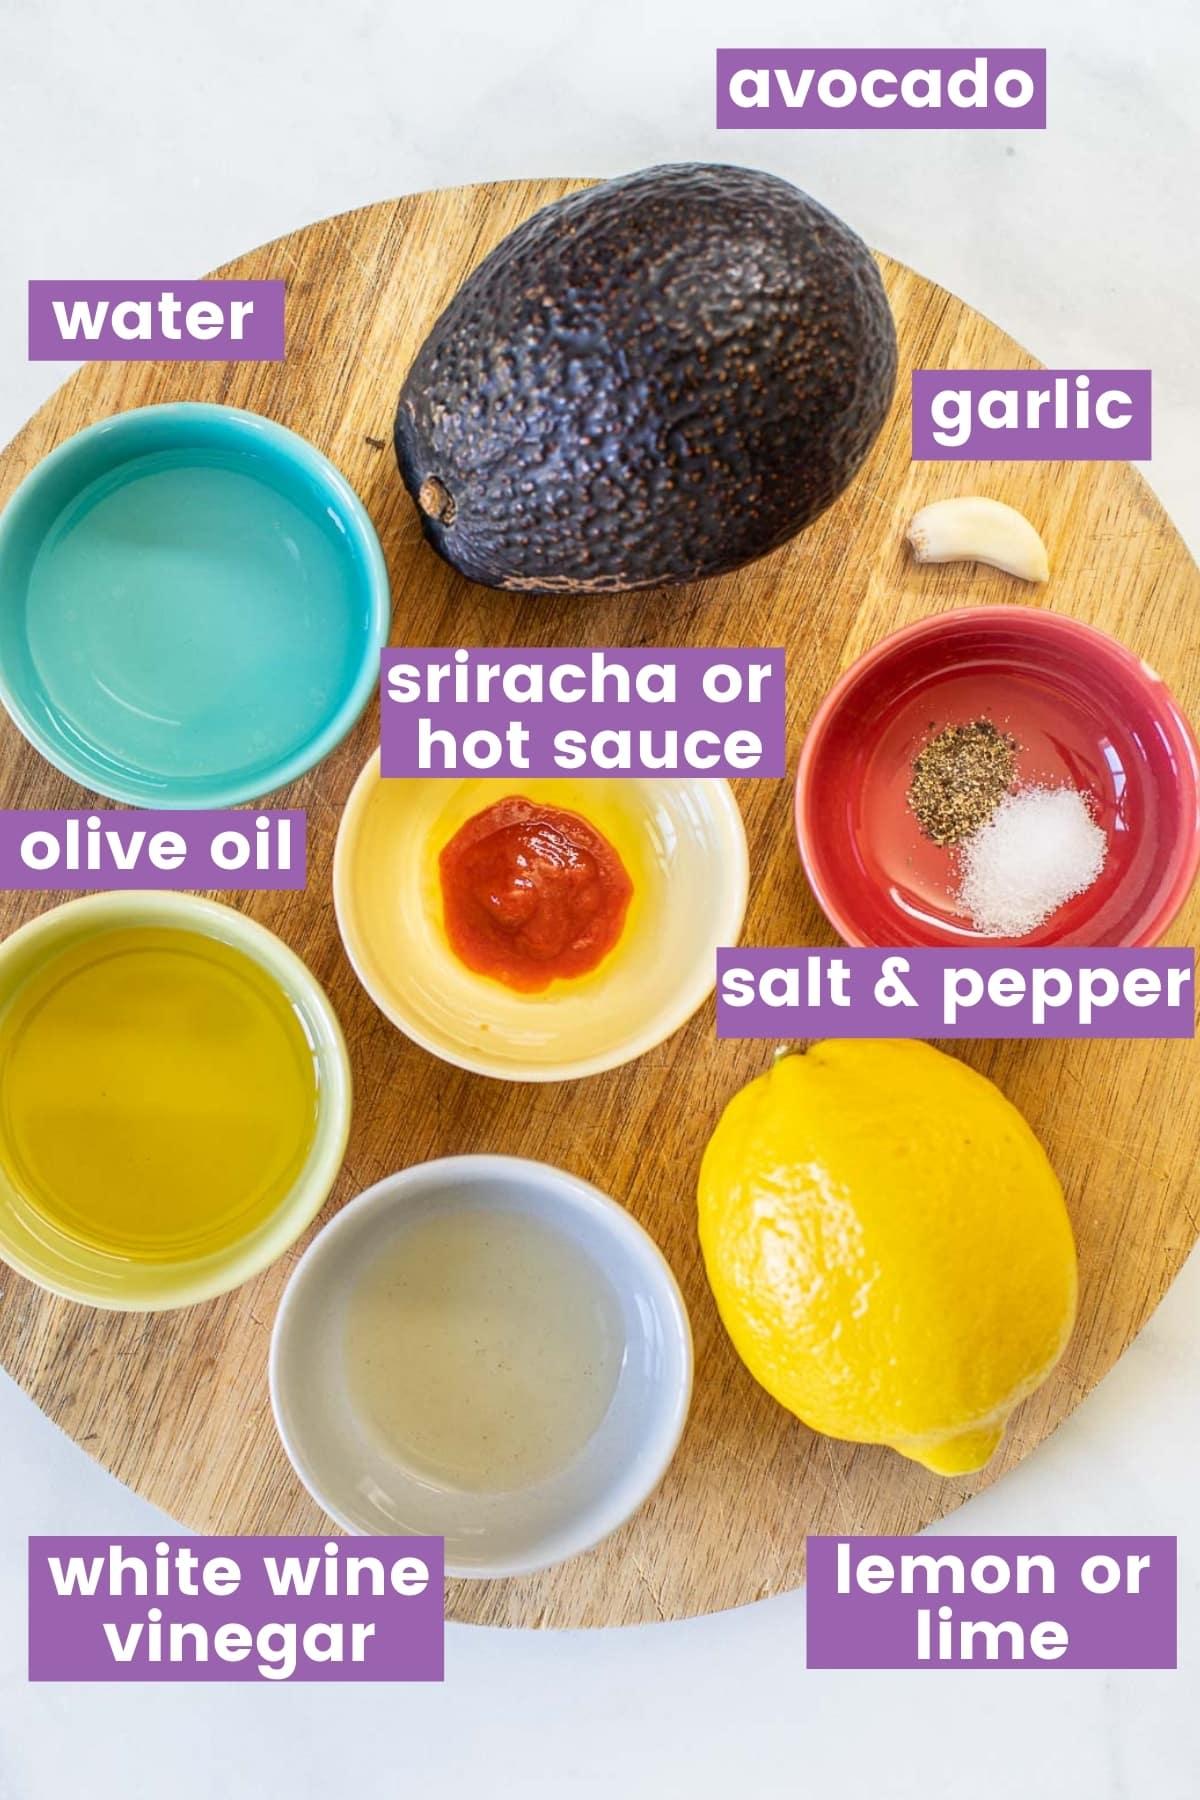 ingredients for vegan avocado dressing as per written ingredient list